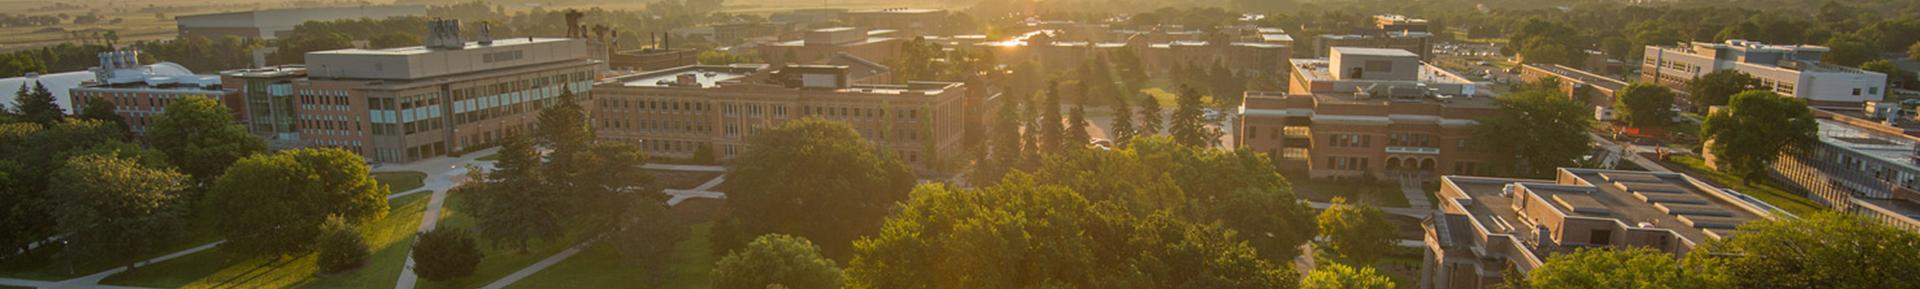 aerial view of South Dakota State University campus